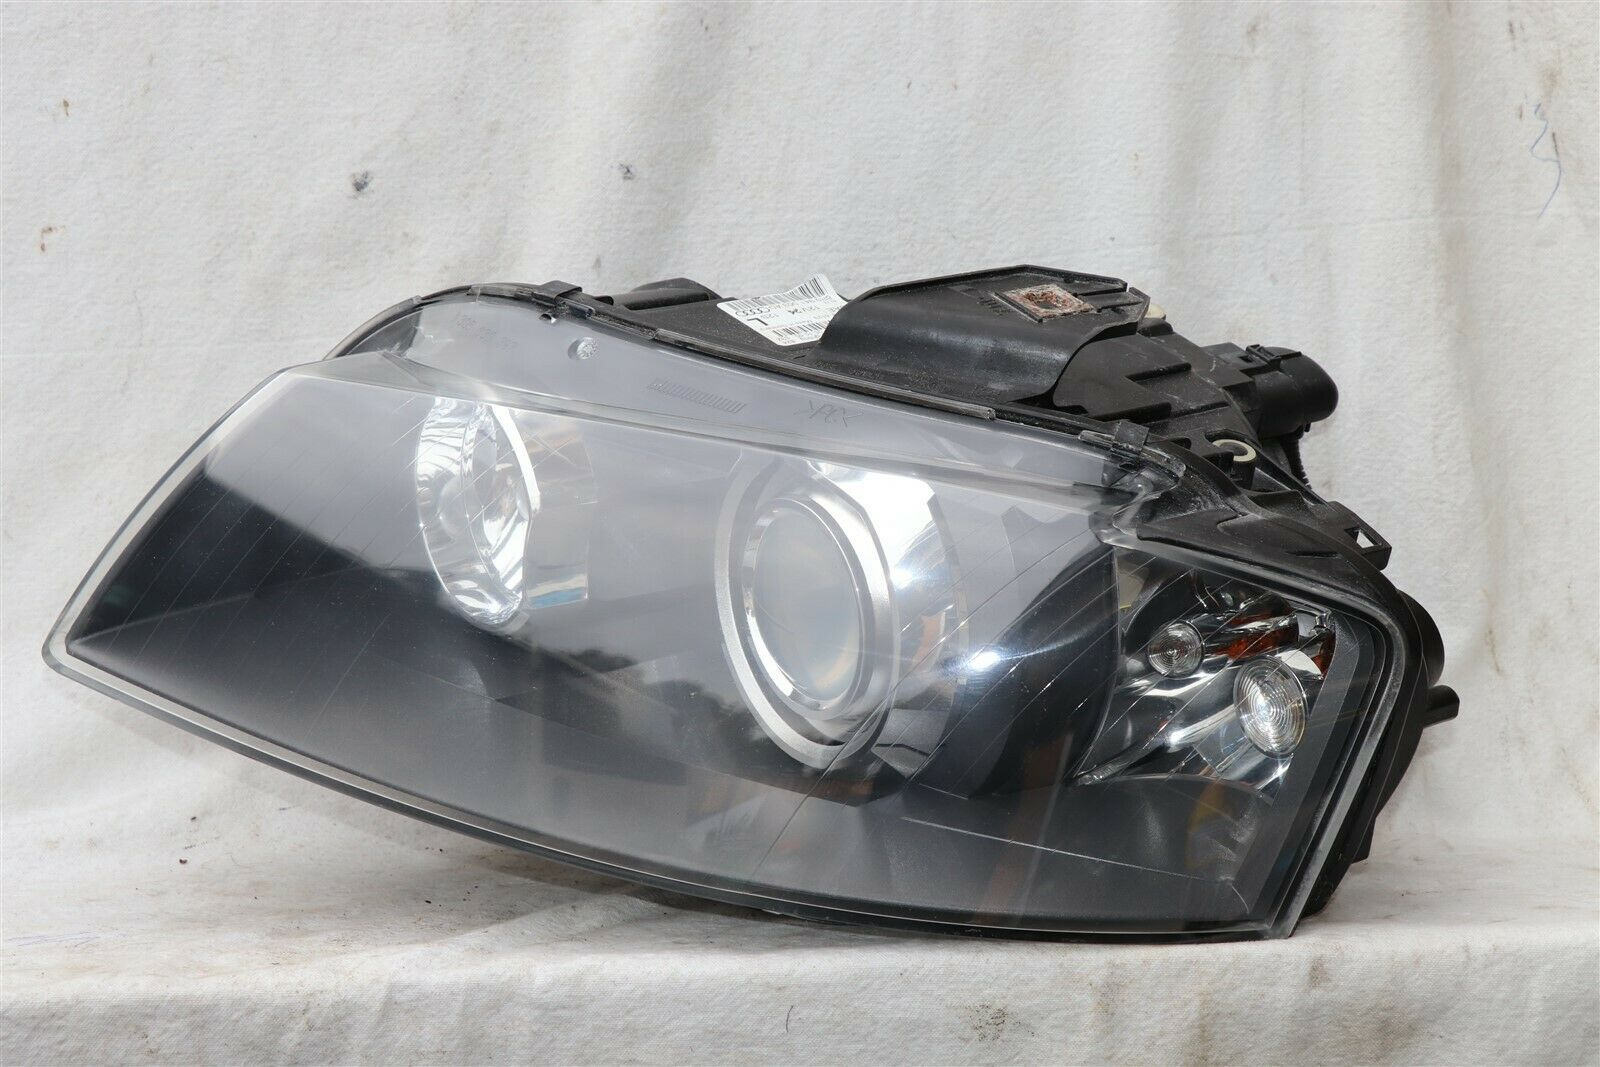 06-08 Audi A3 Xenon HID Headlight Head Light Lamp Driver Left LH POLISHED